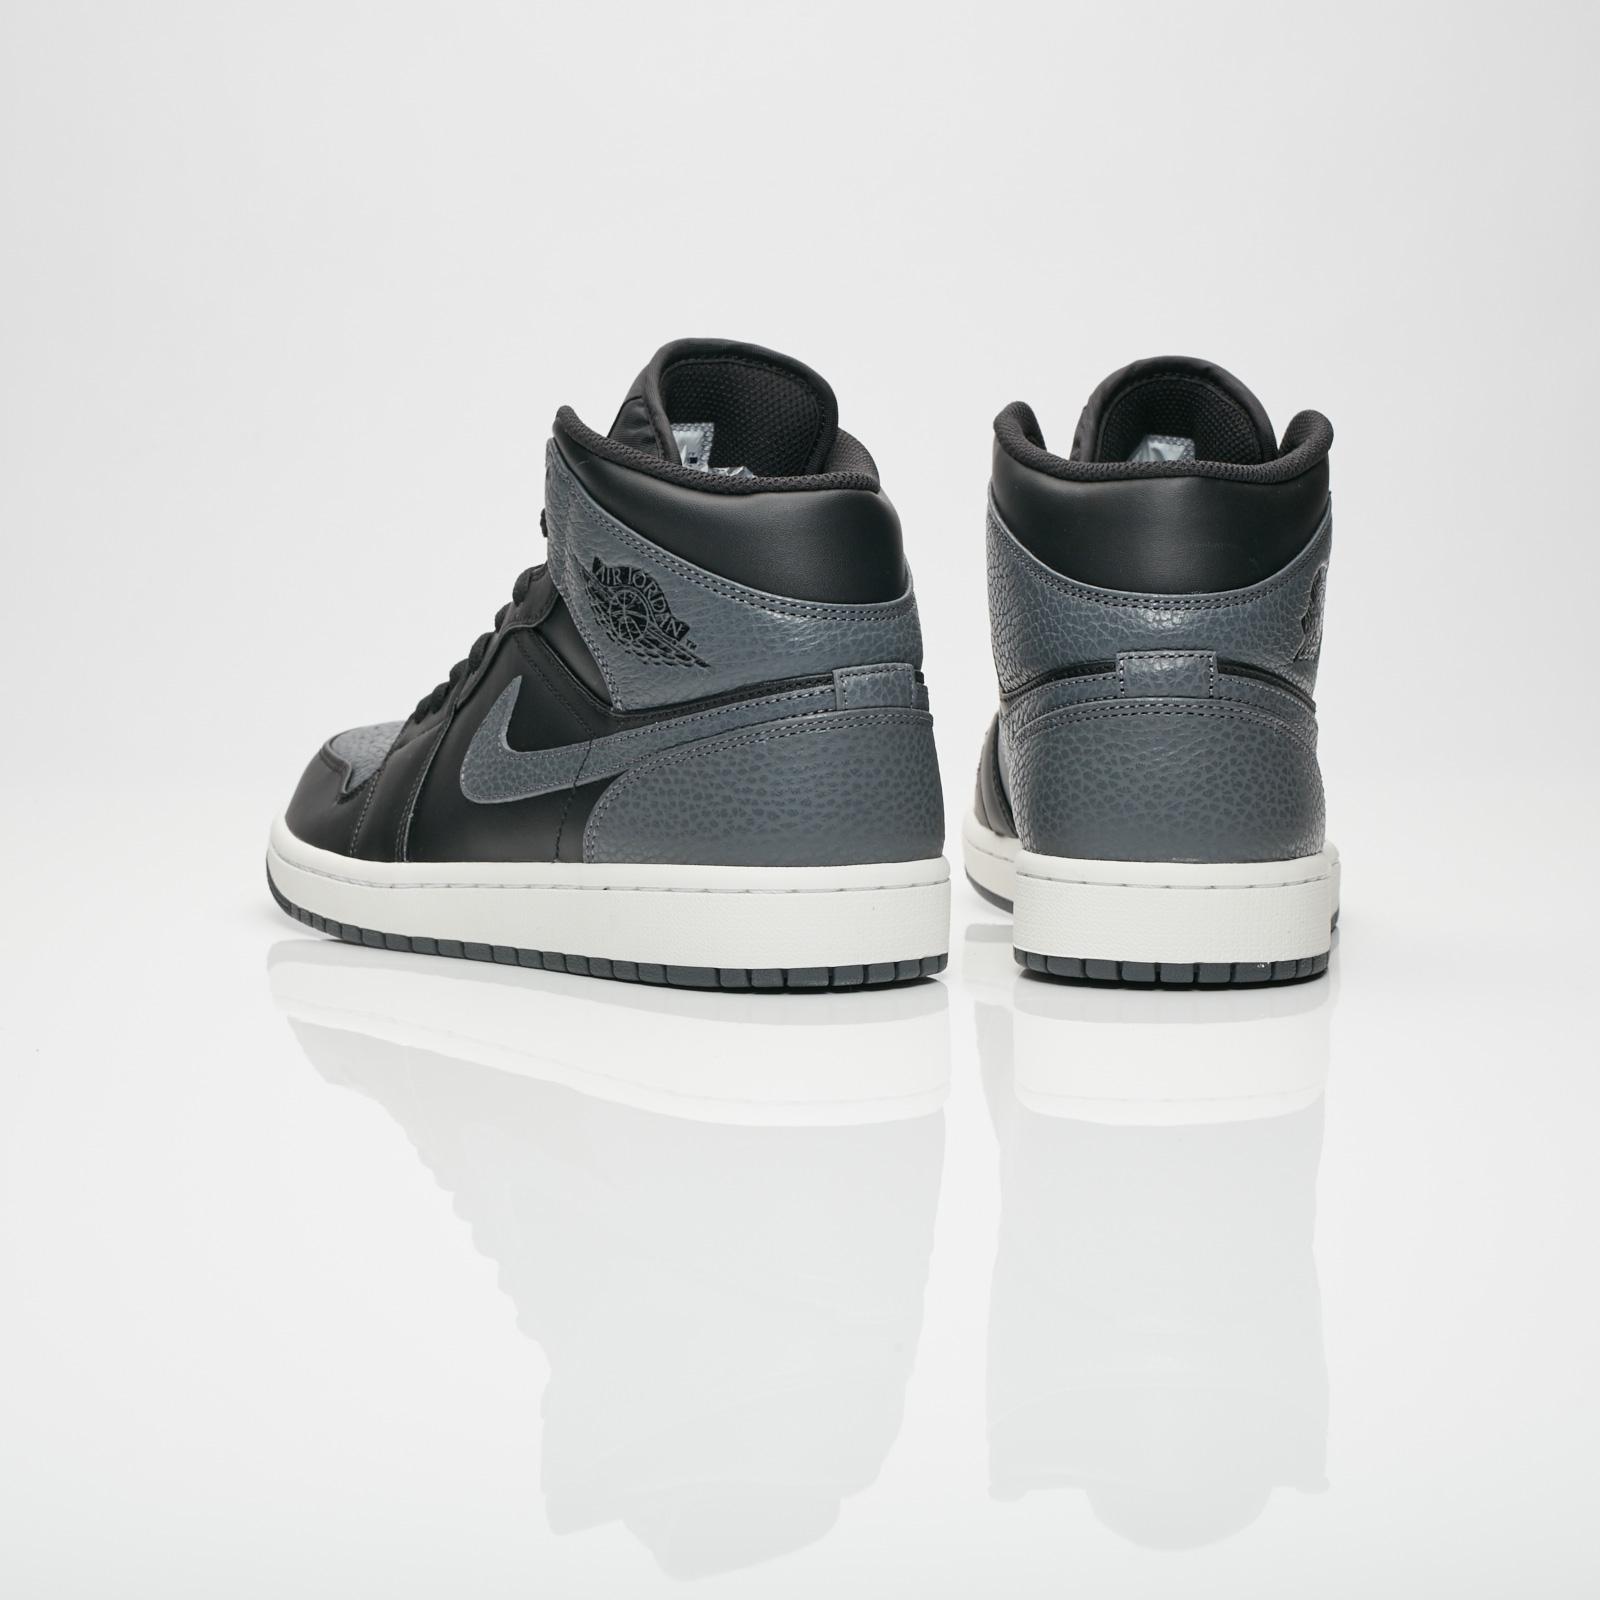 259bedb1144 Jordan Brand Air Jordan 1 Mid - 554724-041 - Sneakersnstuff ...